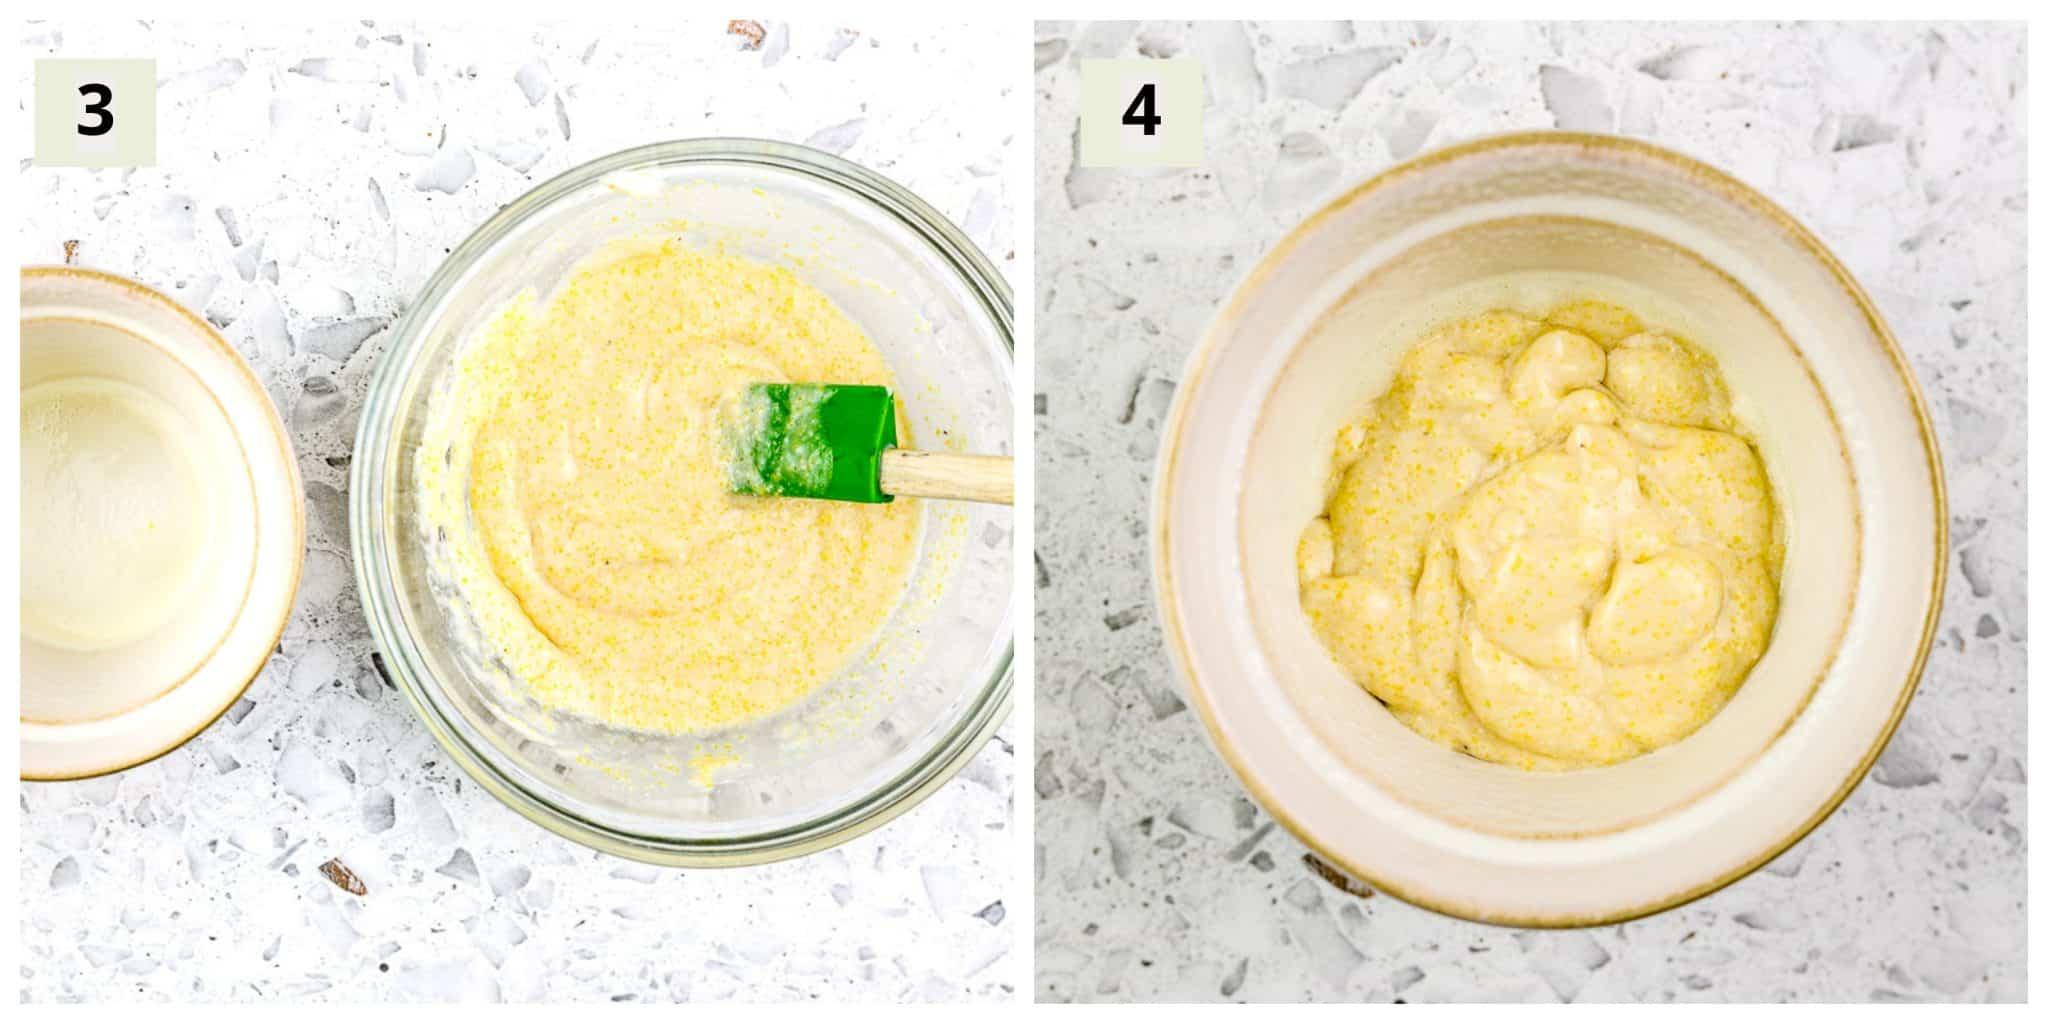 Process shots to make cornbread.